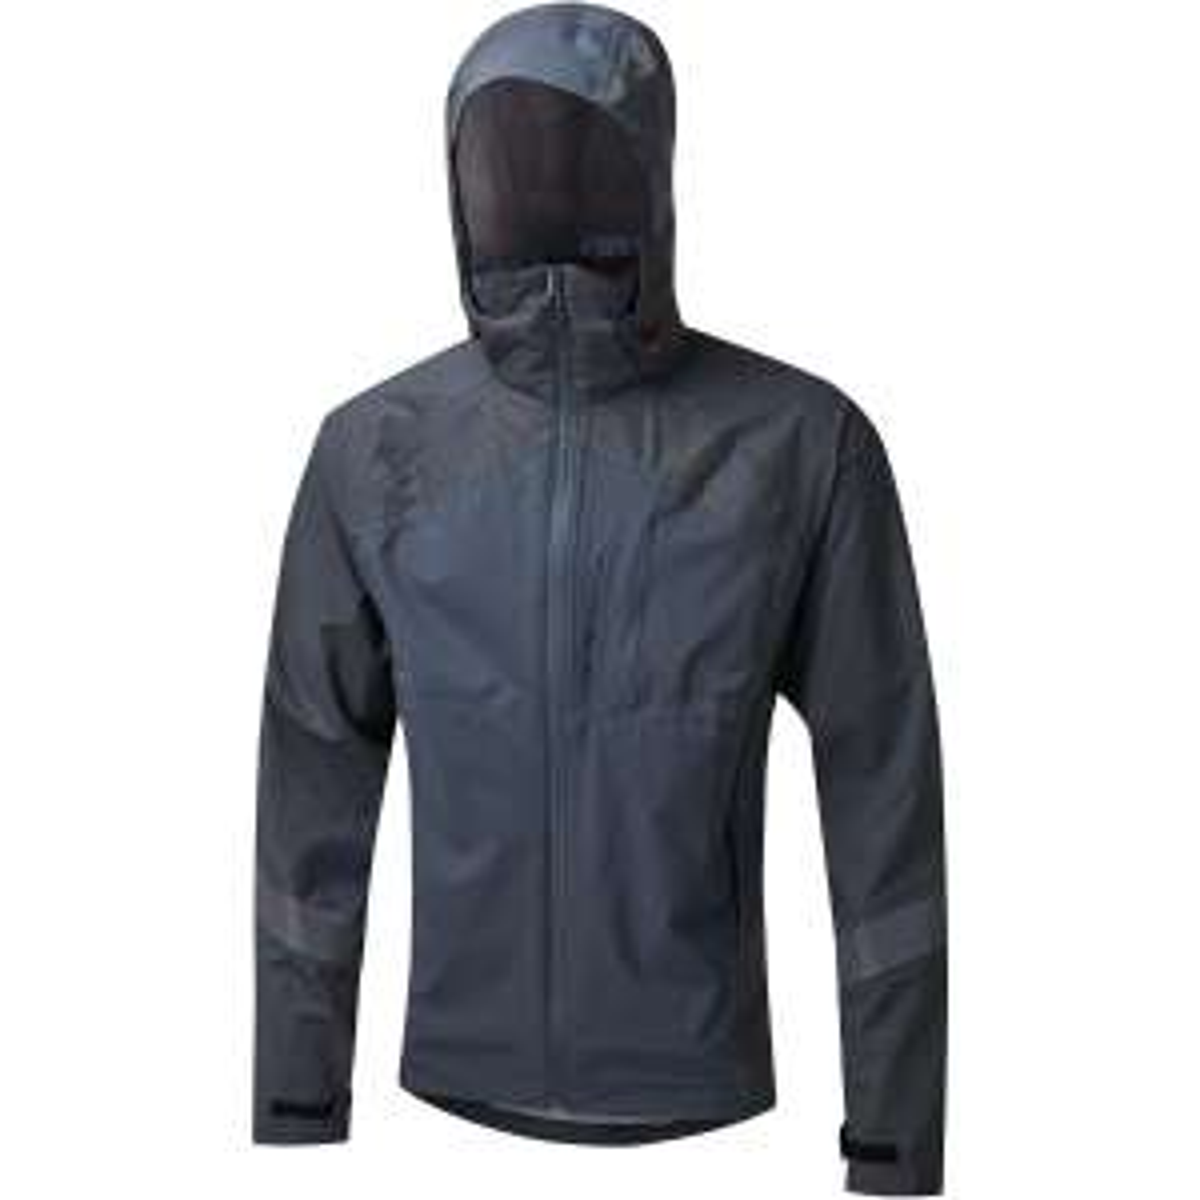 Altura Nightvision Hurricane Waterproof Jacket - £69.99 delivered @ Altura